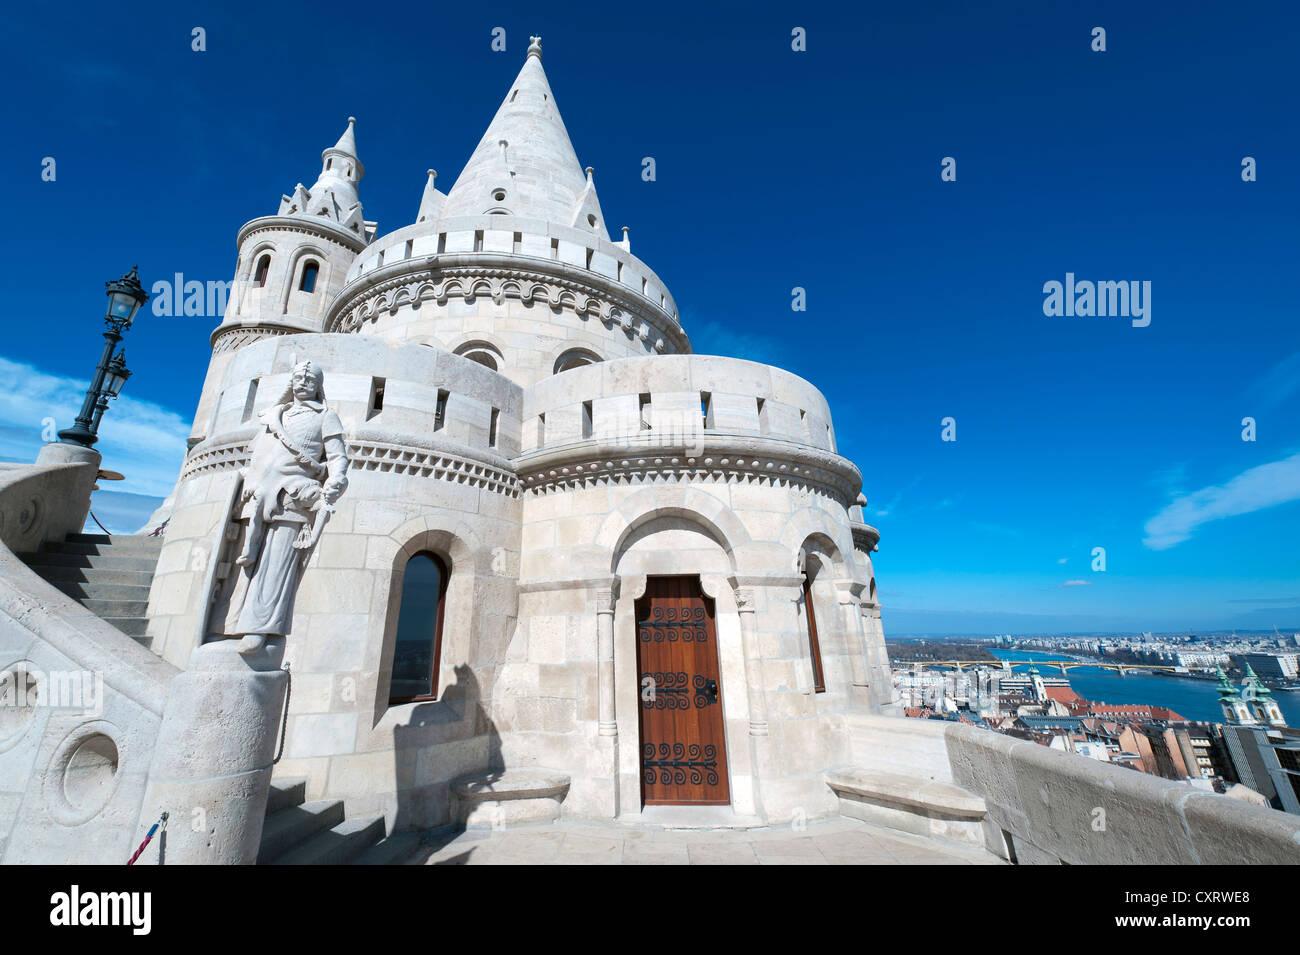 Halászbástya, Fisherman's Bastion, castle hill, Budapest, Hungary, Europe Stock Photo